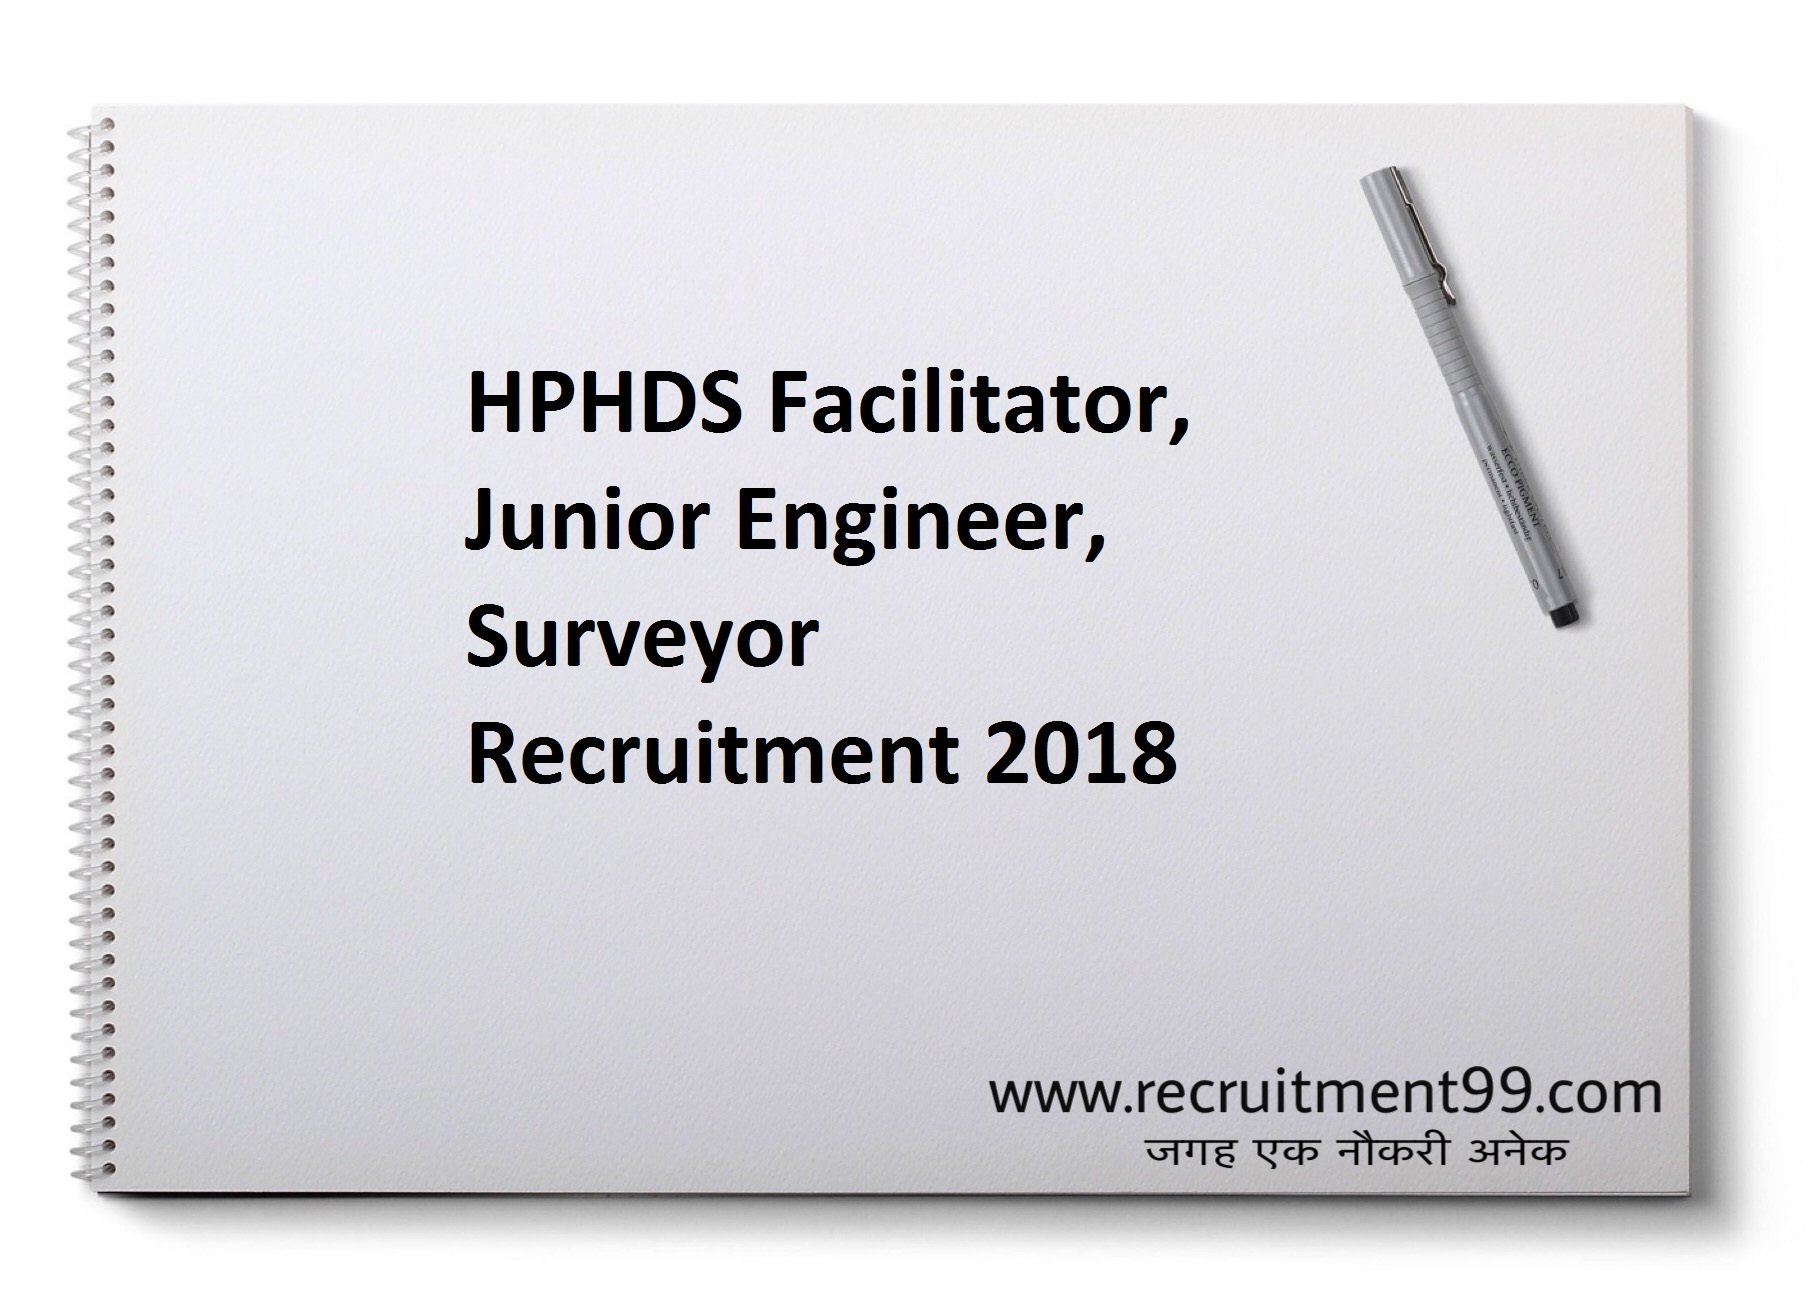 HPHDS Facilitator Junior Engineer Surveyor Admit Card & Result 2018